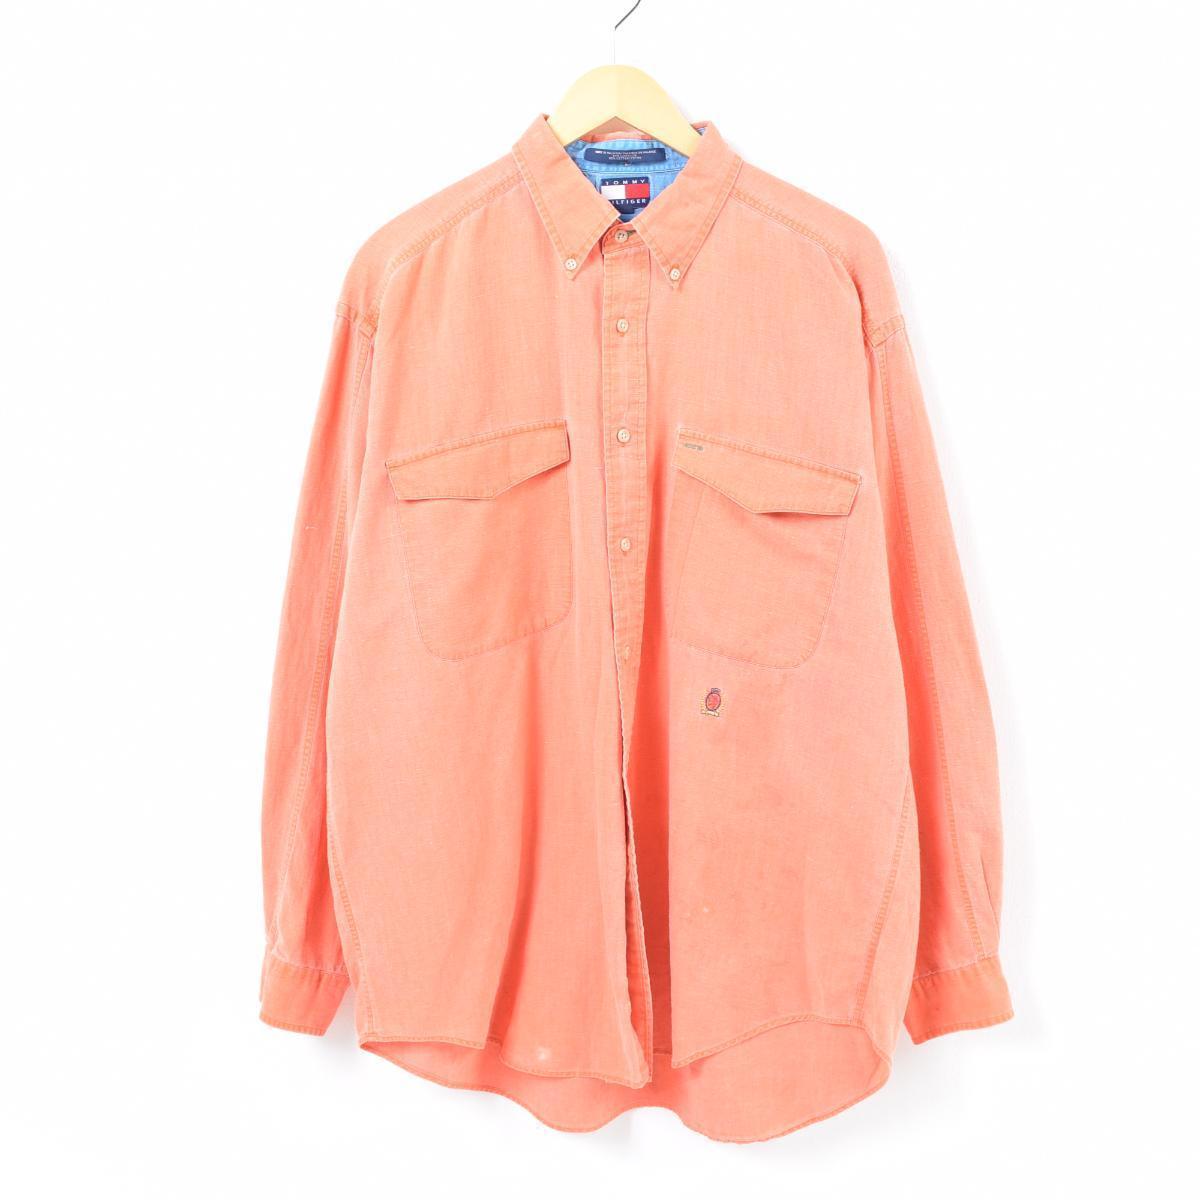 289c1d90c4cf 90s トミーヒルフィガー TOMMY HILFIGER long sleeves linen X cotton button-down shirt  men XL  was2232